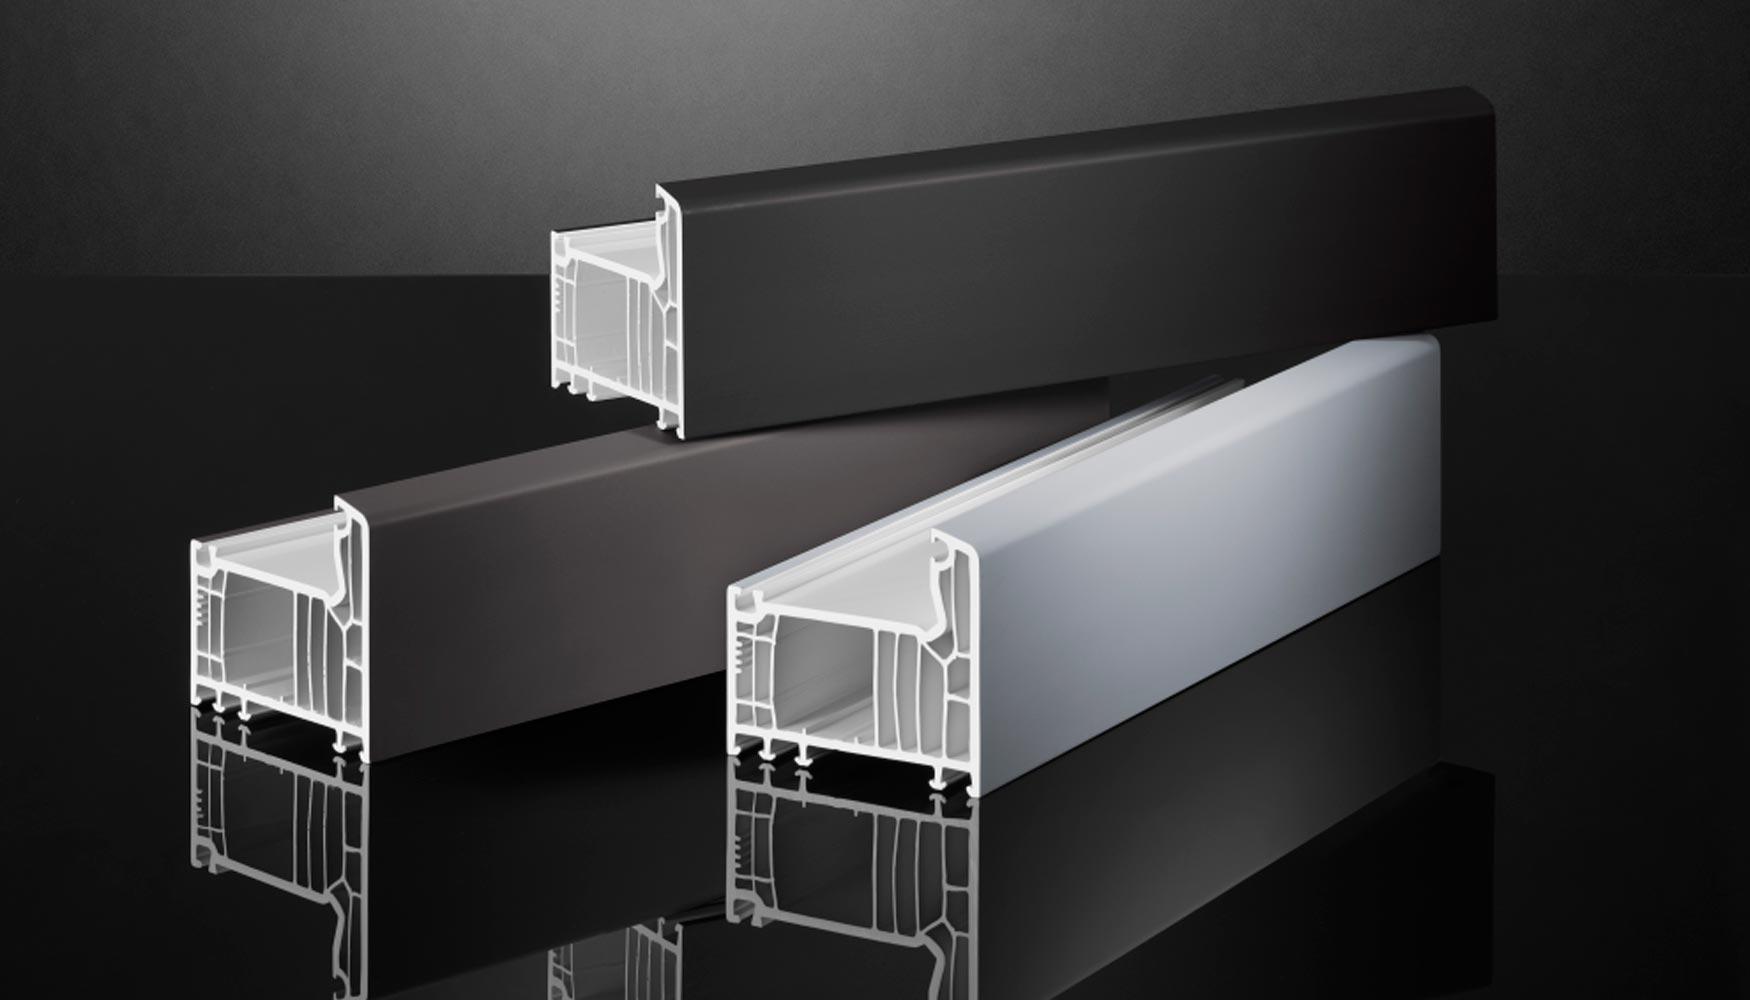 Ventanas pvc gris antracita top trendy pvc blanco ref for Ventanas aluminio gris antracita